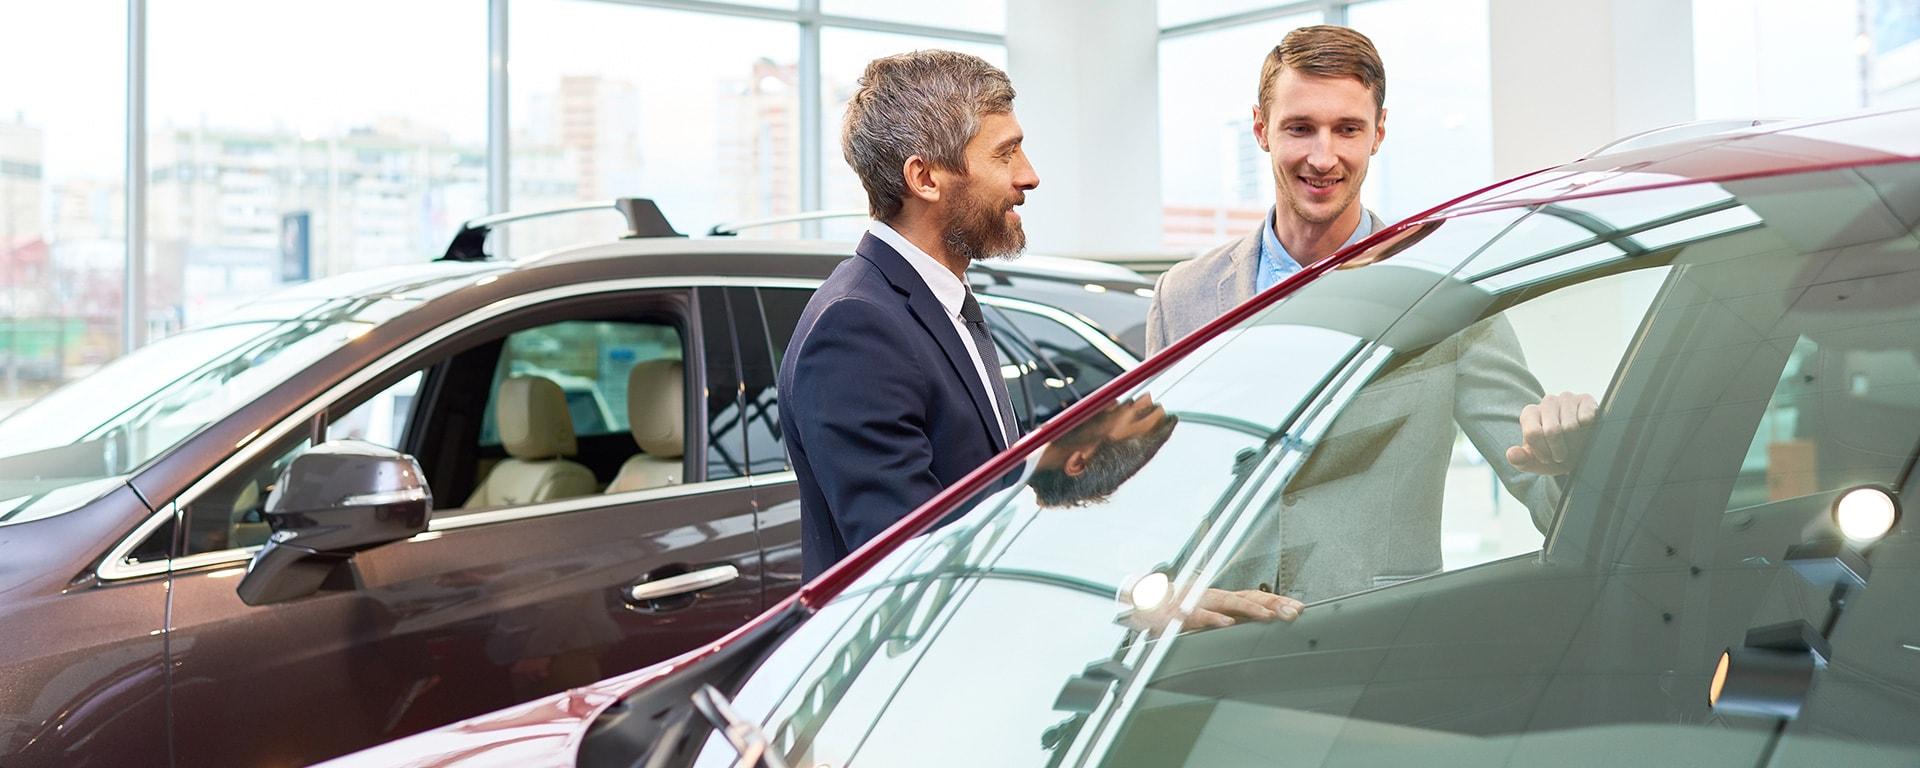 huk autowelt success story header